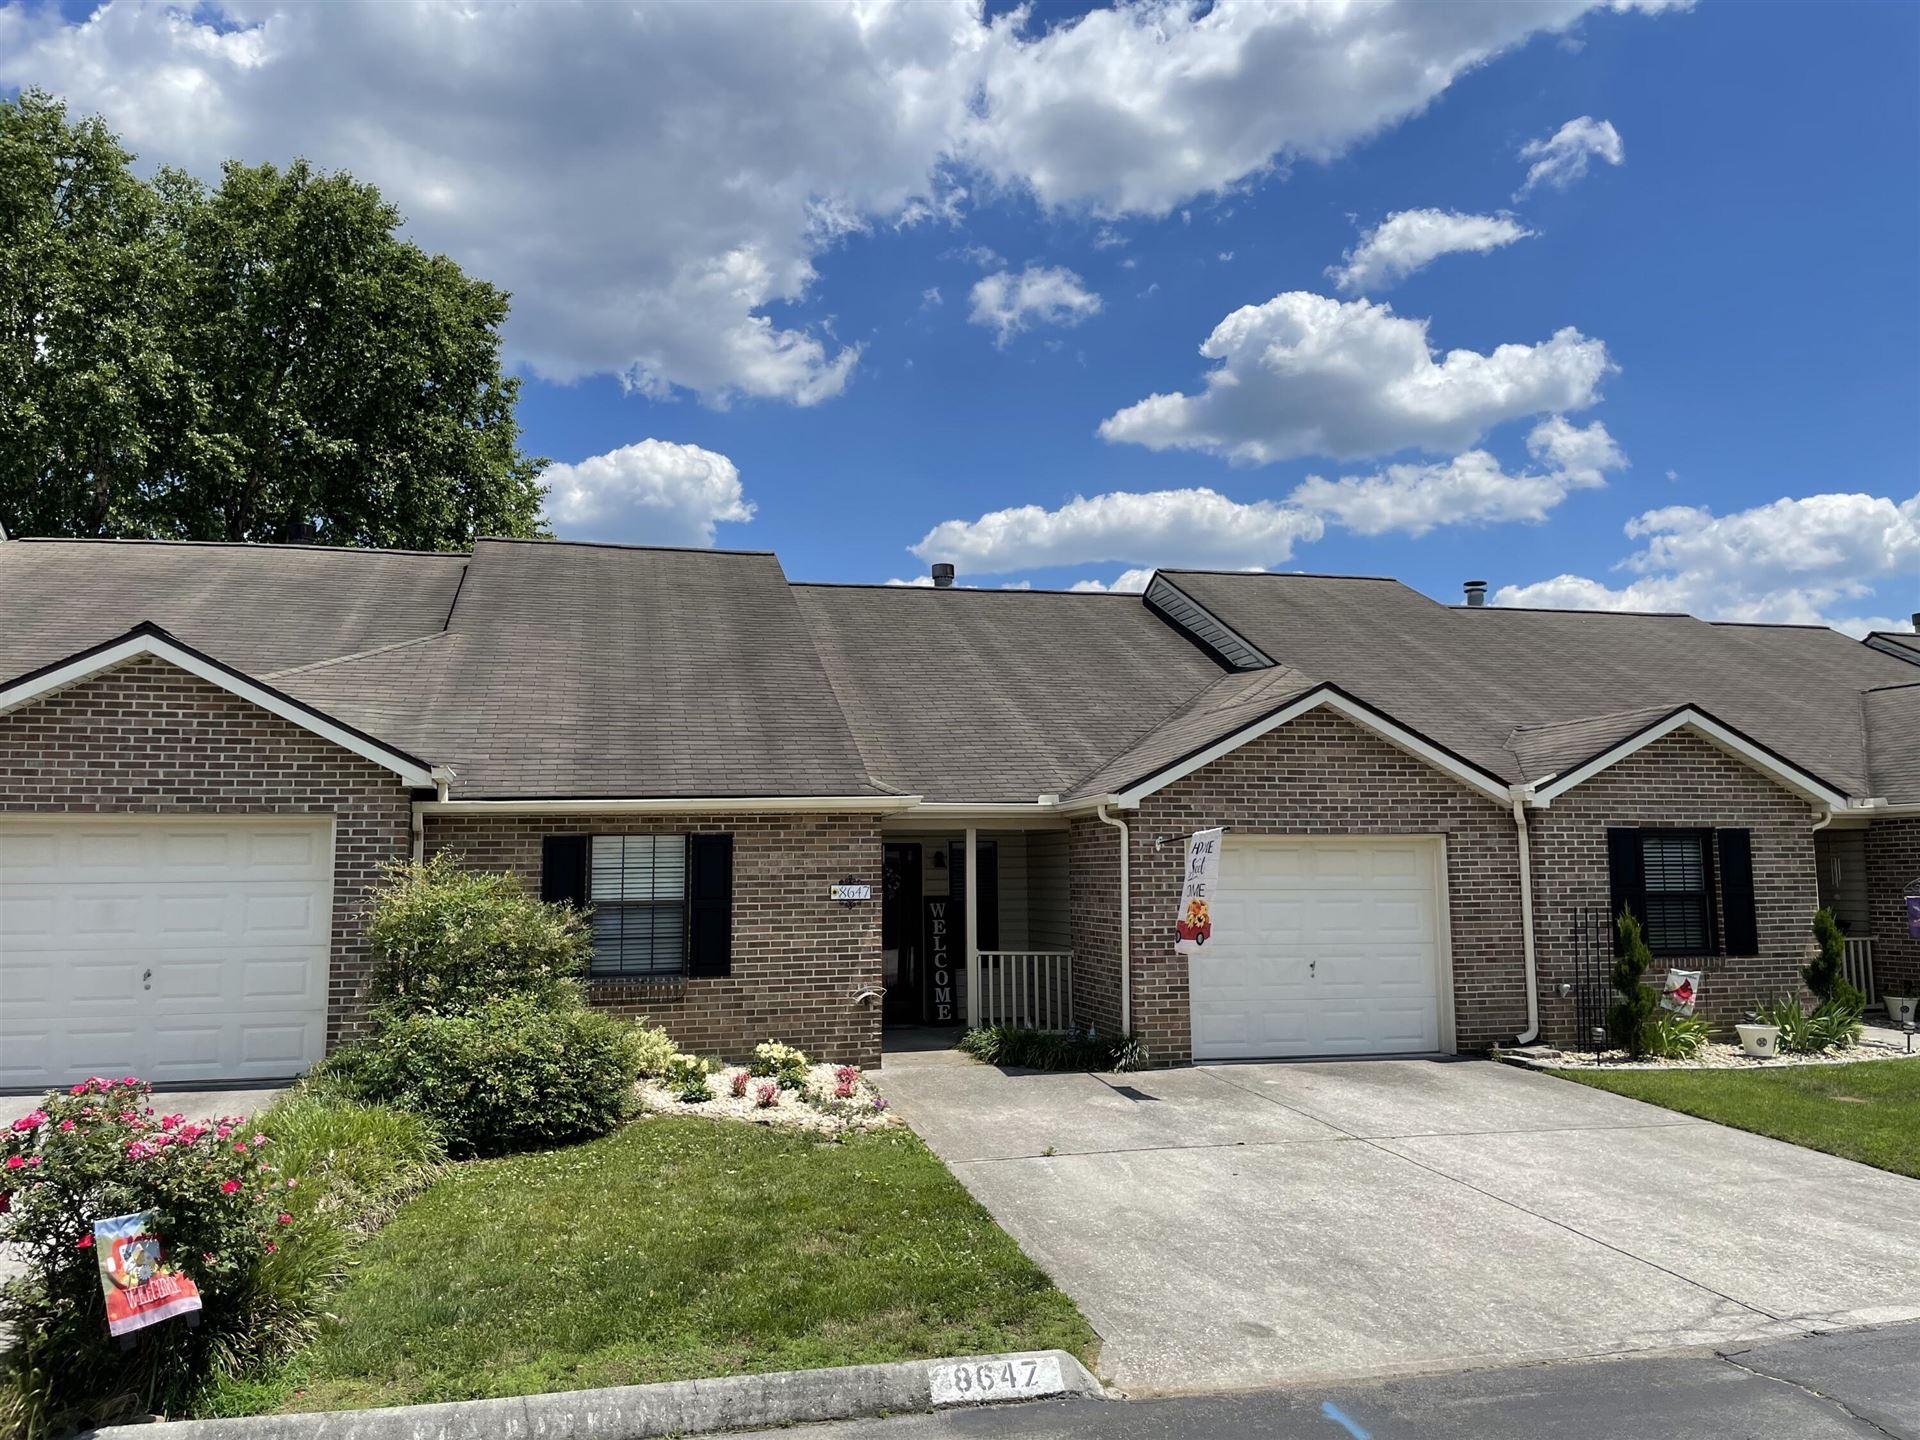 Photo of 8647 Denmark St, Knoxville, TN 37931 (MLS # 1156870)